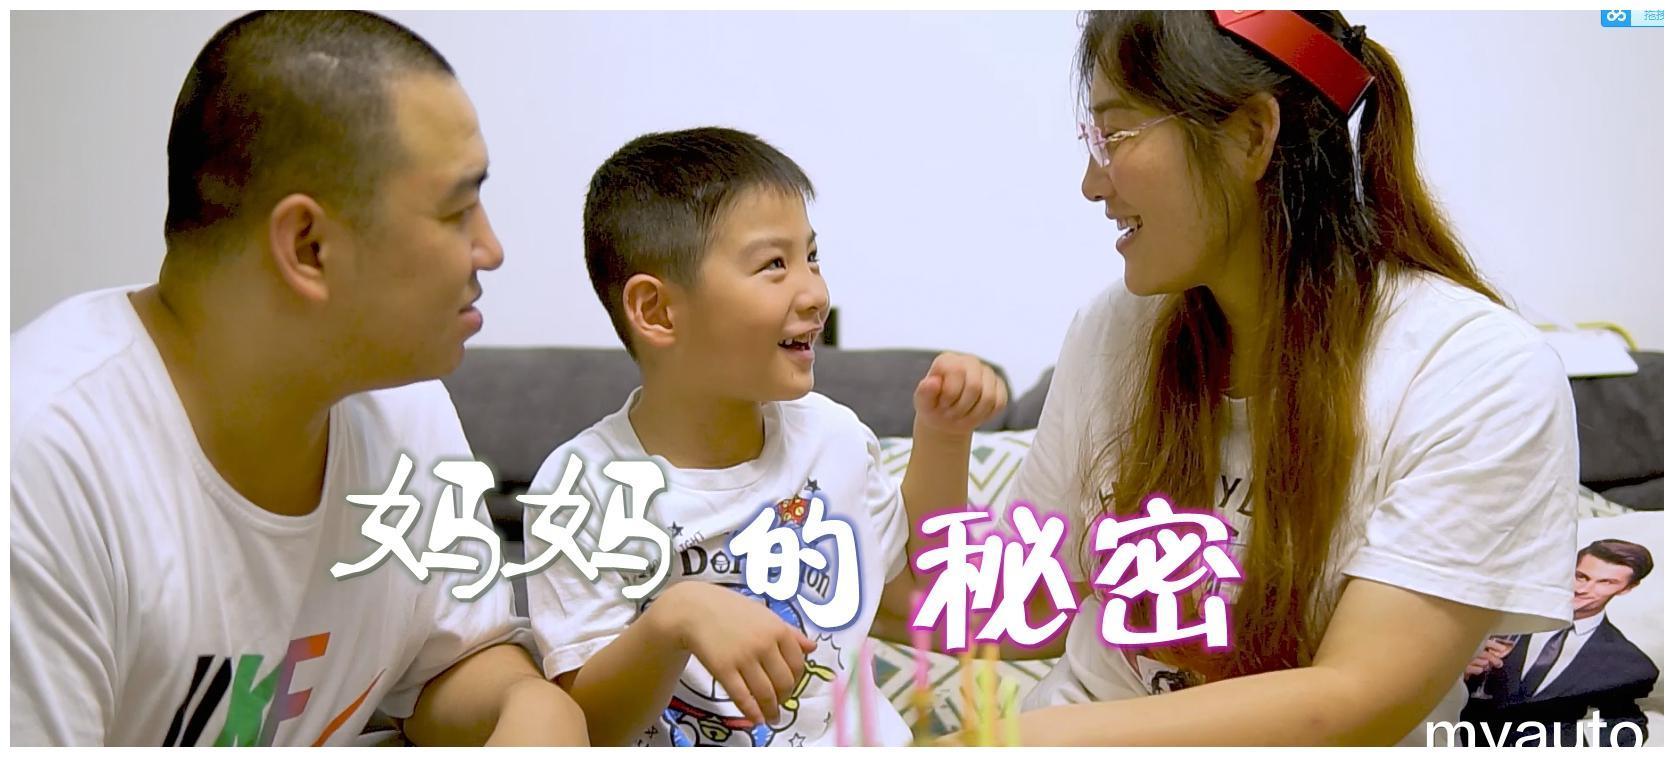 MYAUTO年度微电影《妈妈的秘密》:致敬平凡中的不平凡